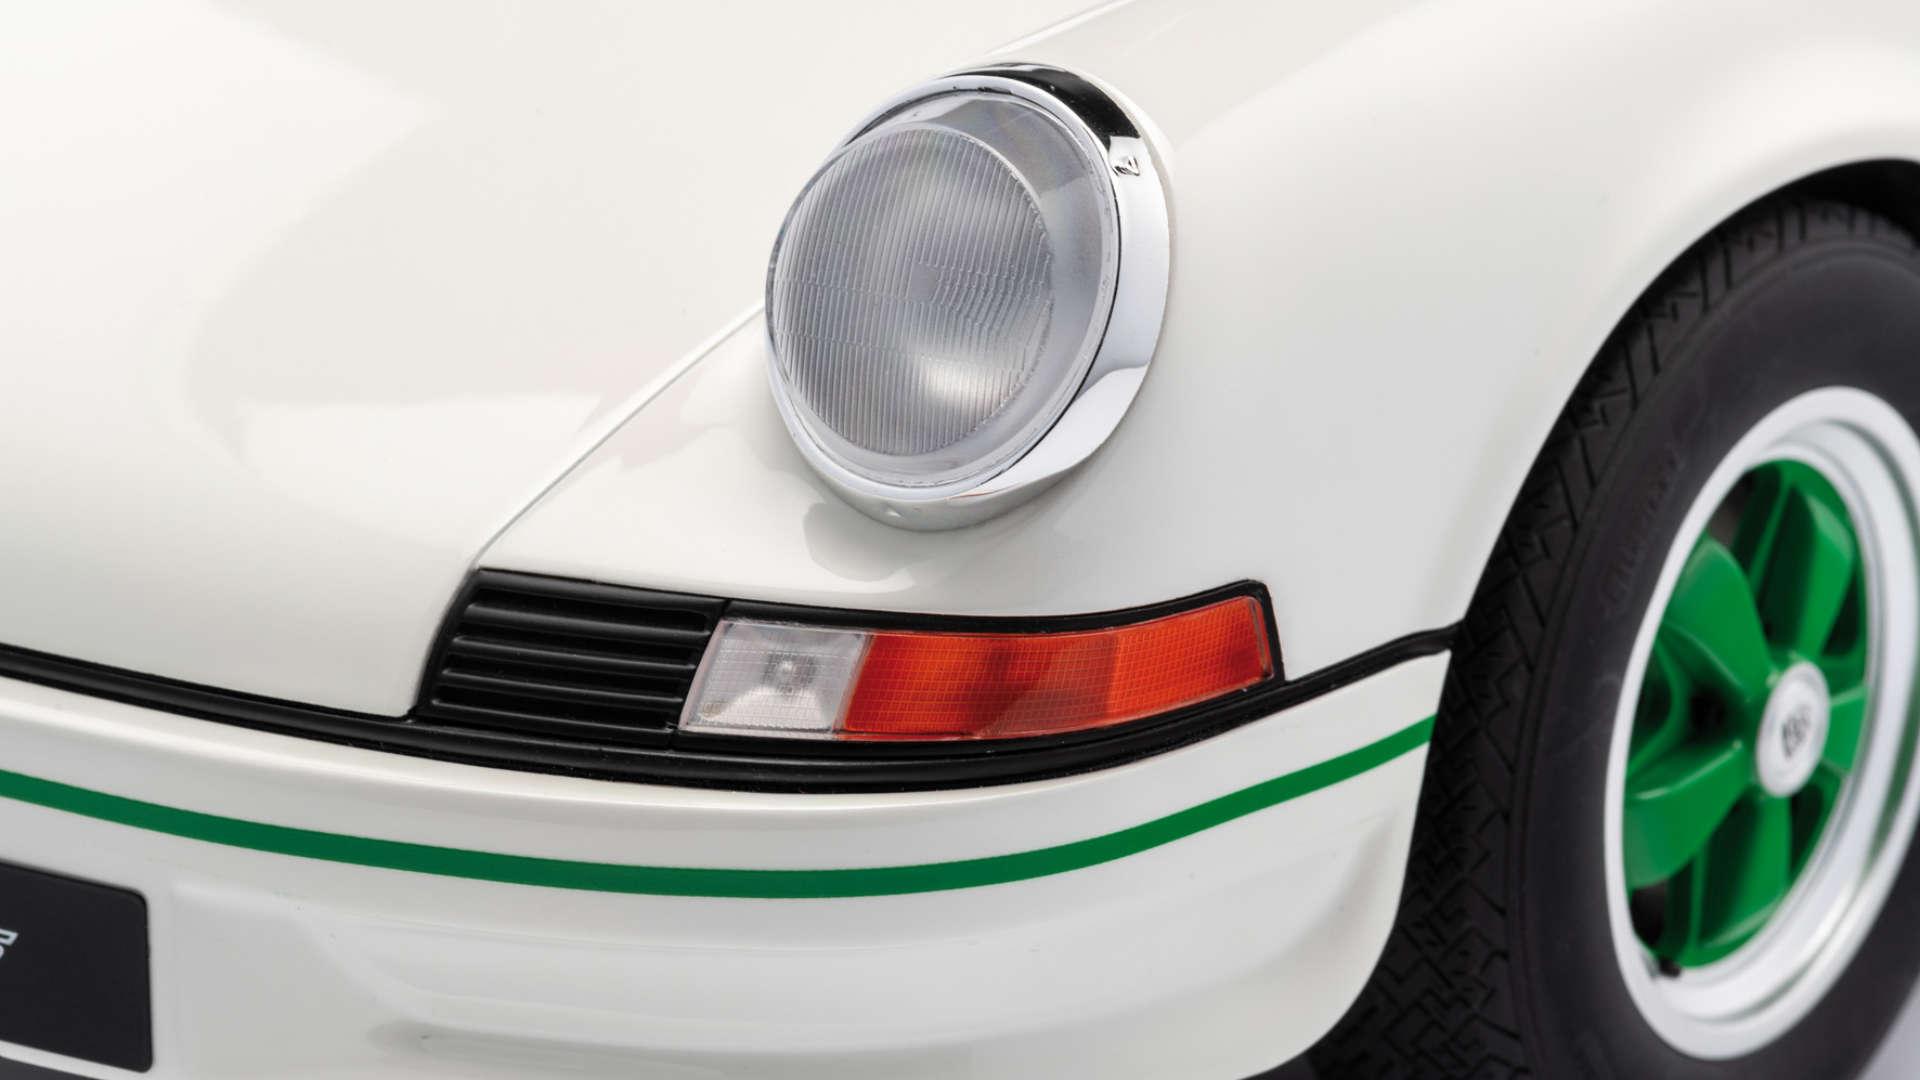 Minichamps PORSCHE 911 CARRERA RS 2.7 LEICHTBAU